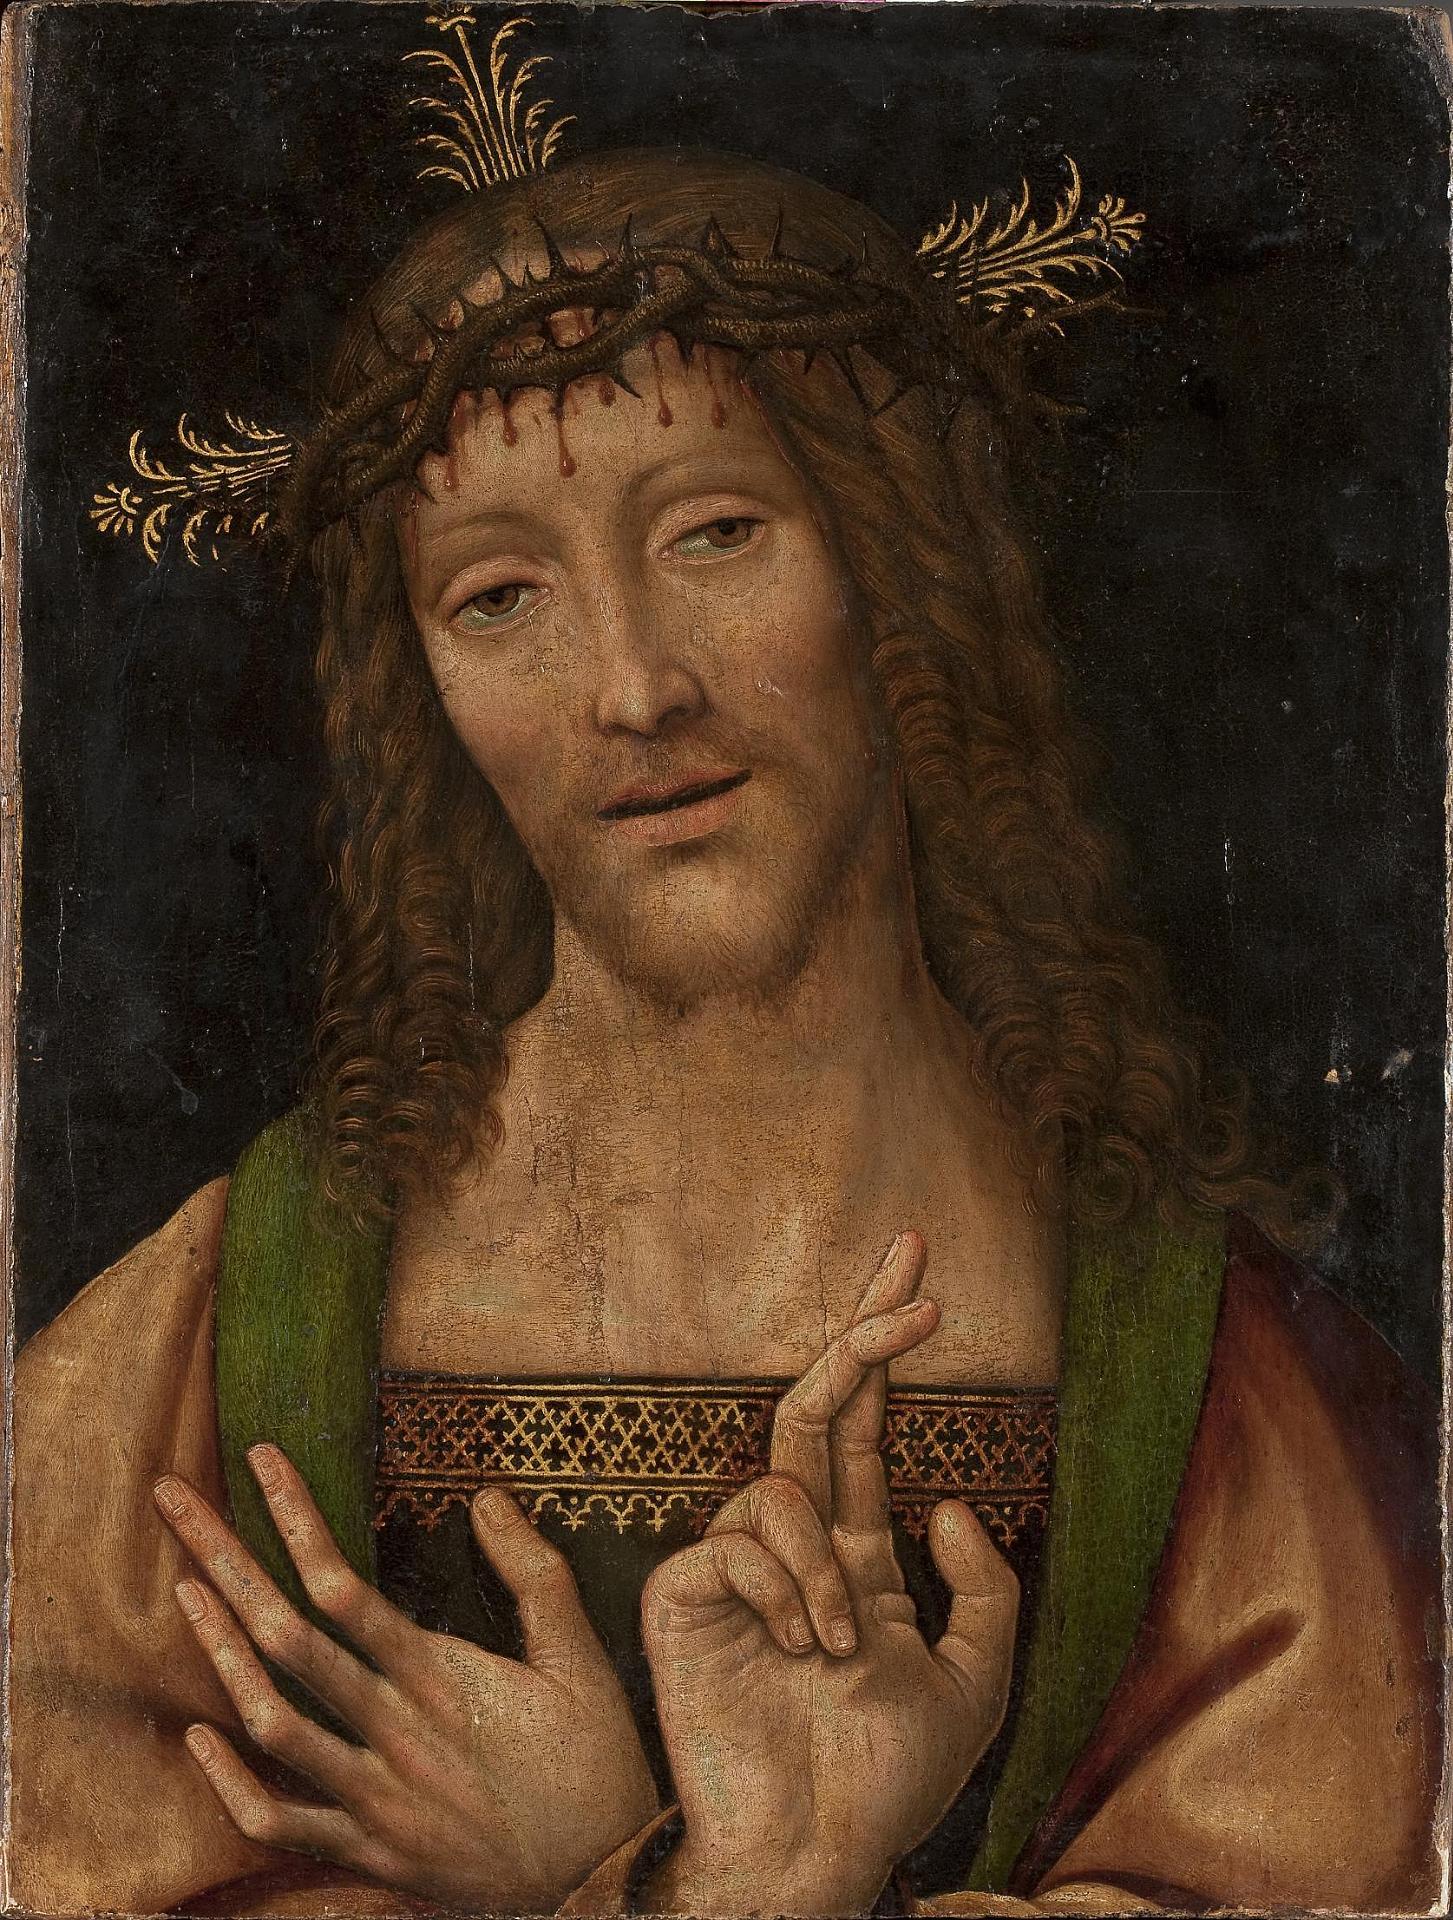 Амброджо Бергоньоне Христос эрмитаж мал.jpg